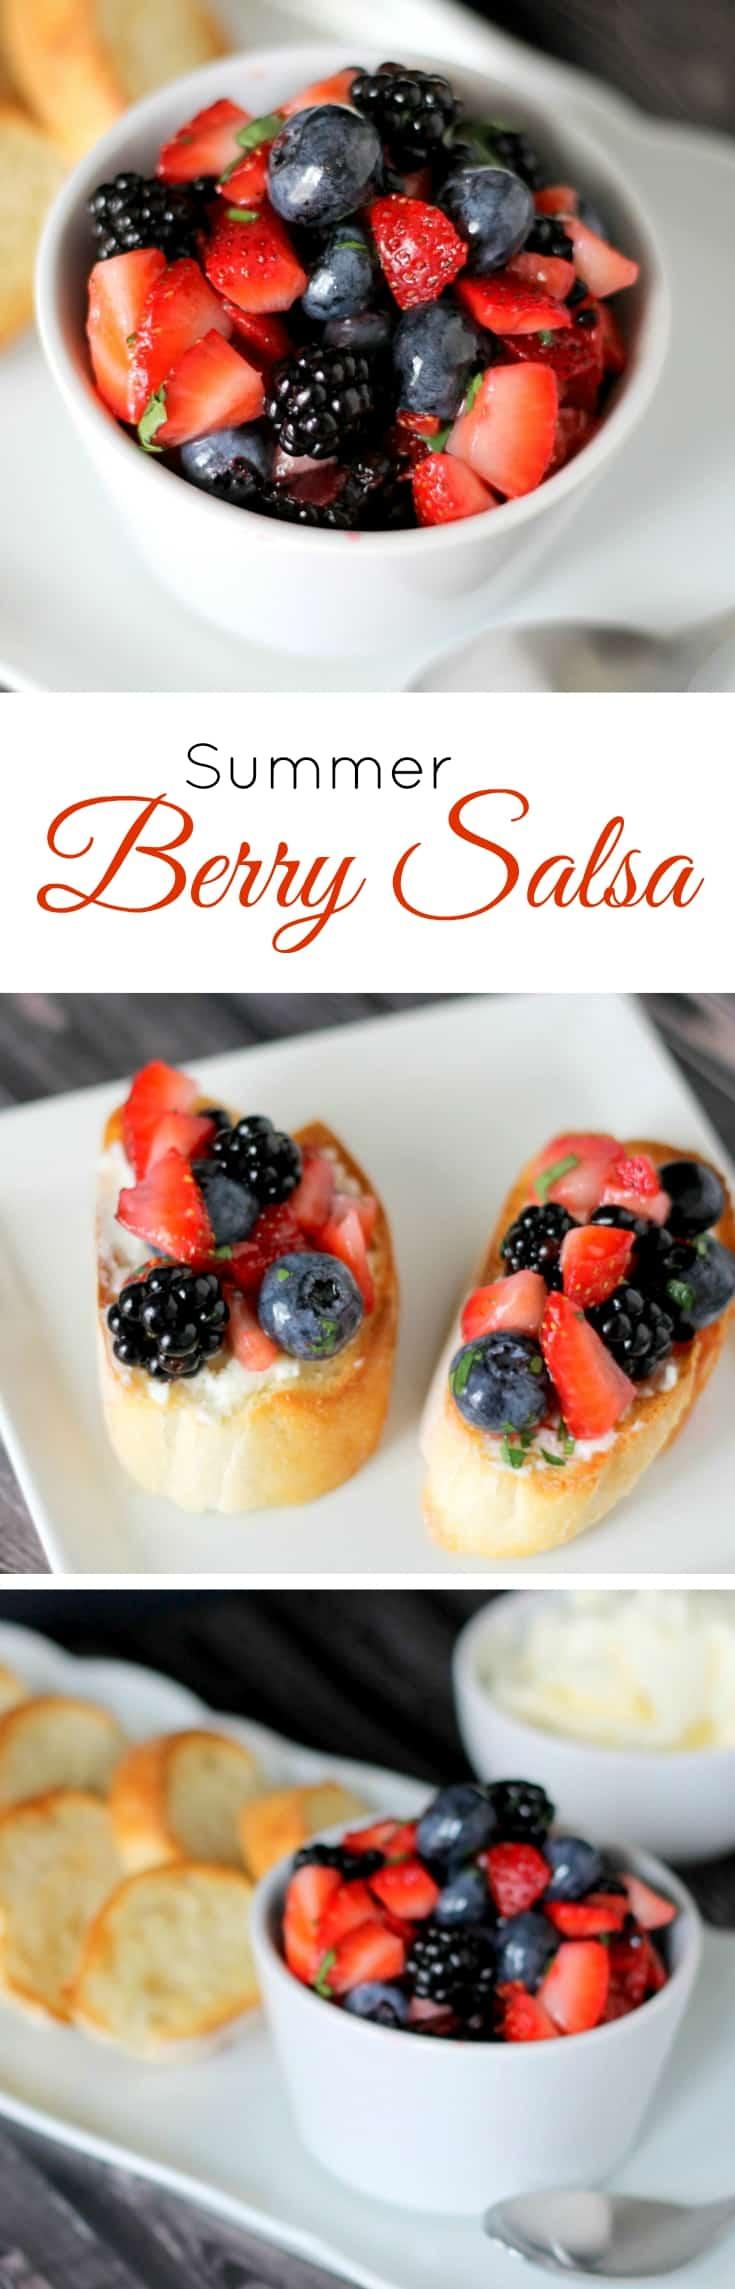 summer berry salsa recipe easy